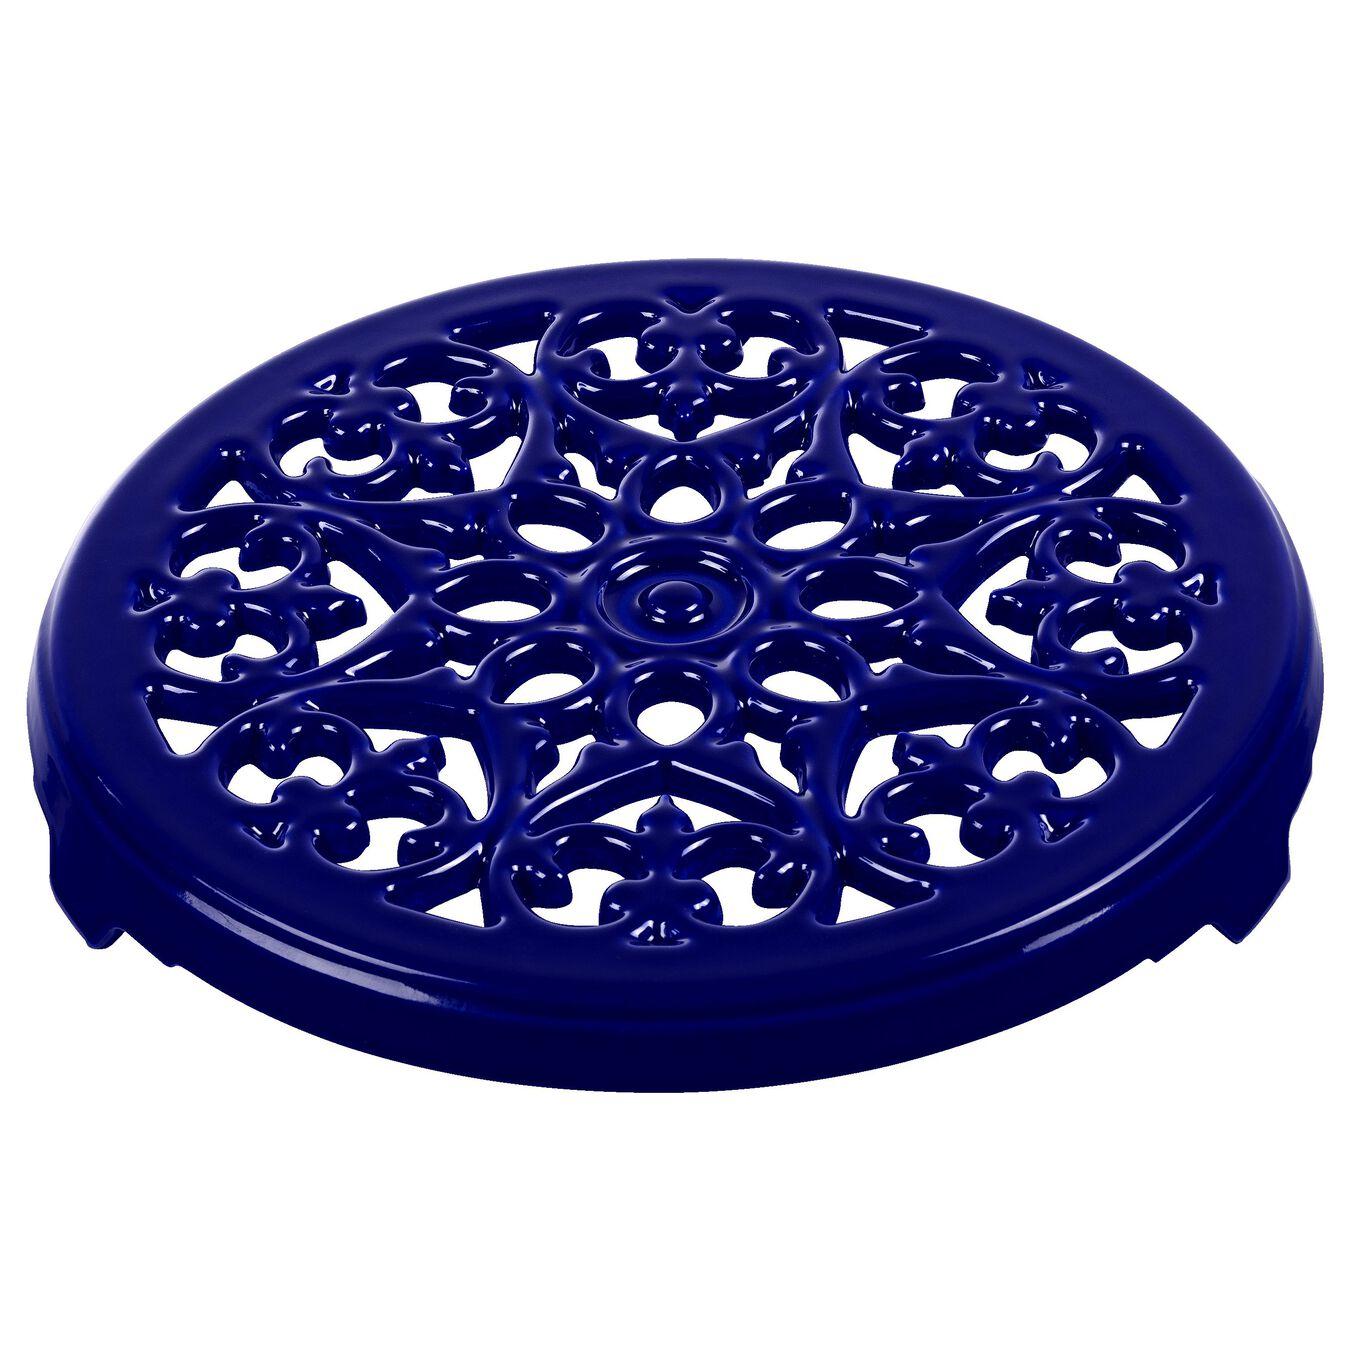 Pot set, lily decal, 2 Piece | round | cast iron | dark-blue,,large 3